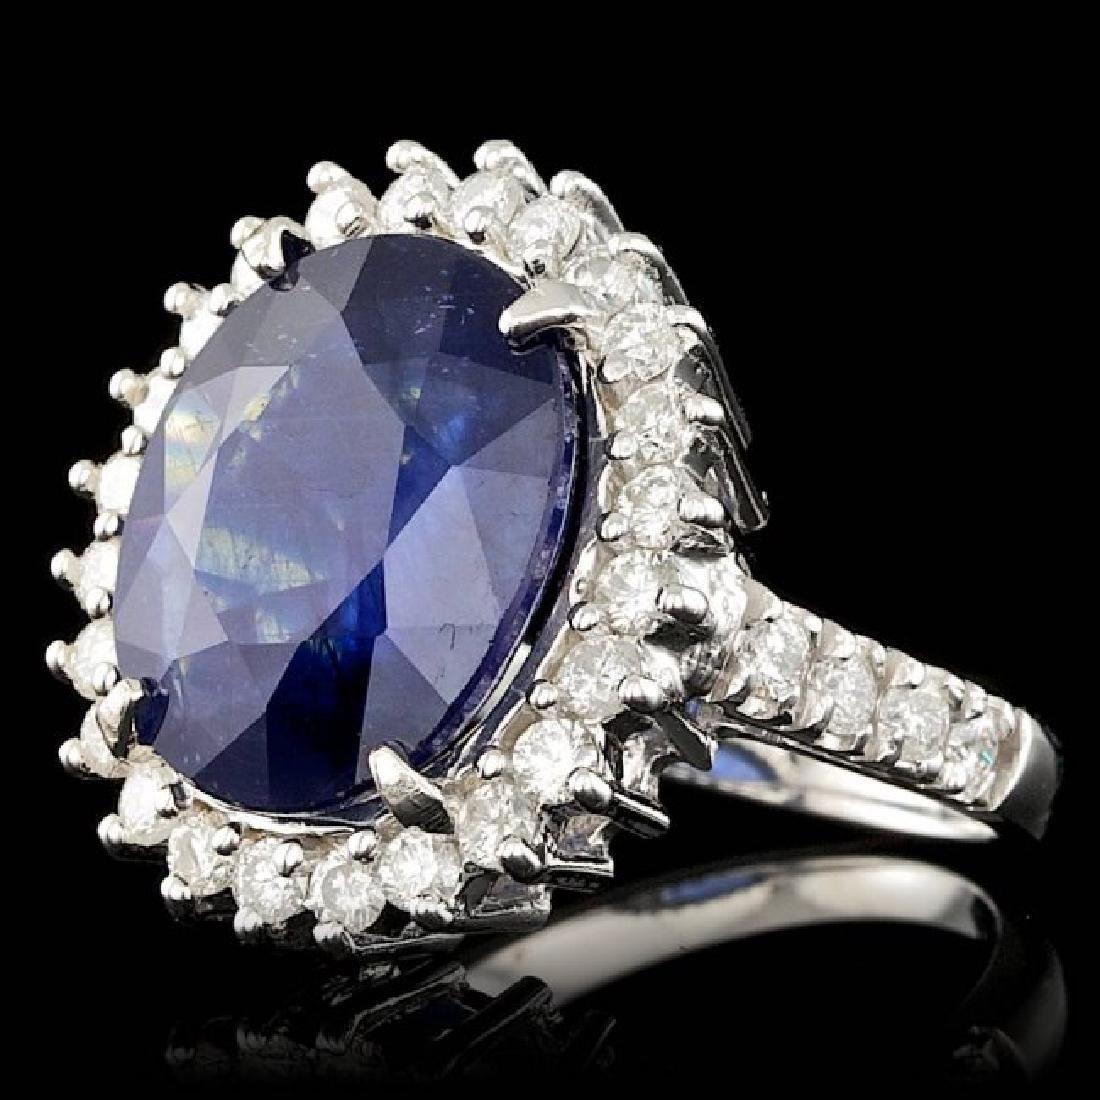 14k Gold 9.00ct Sapphire 1.10ct Diamond Ring - 2